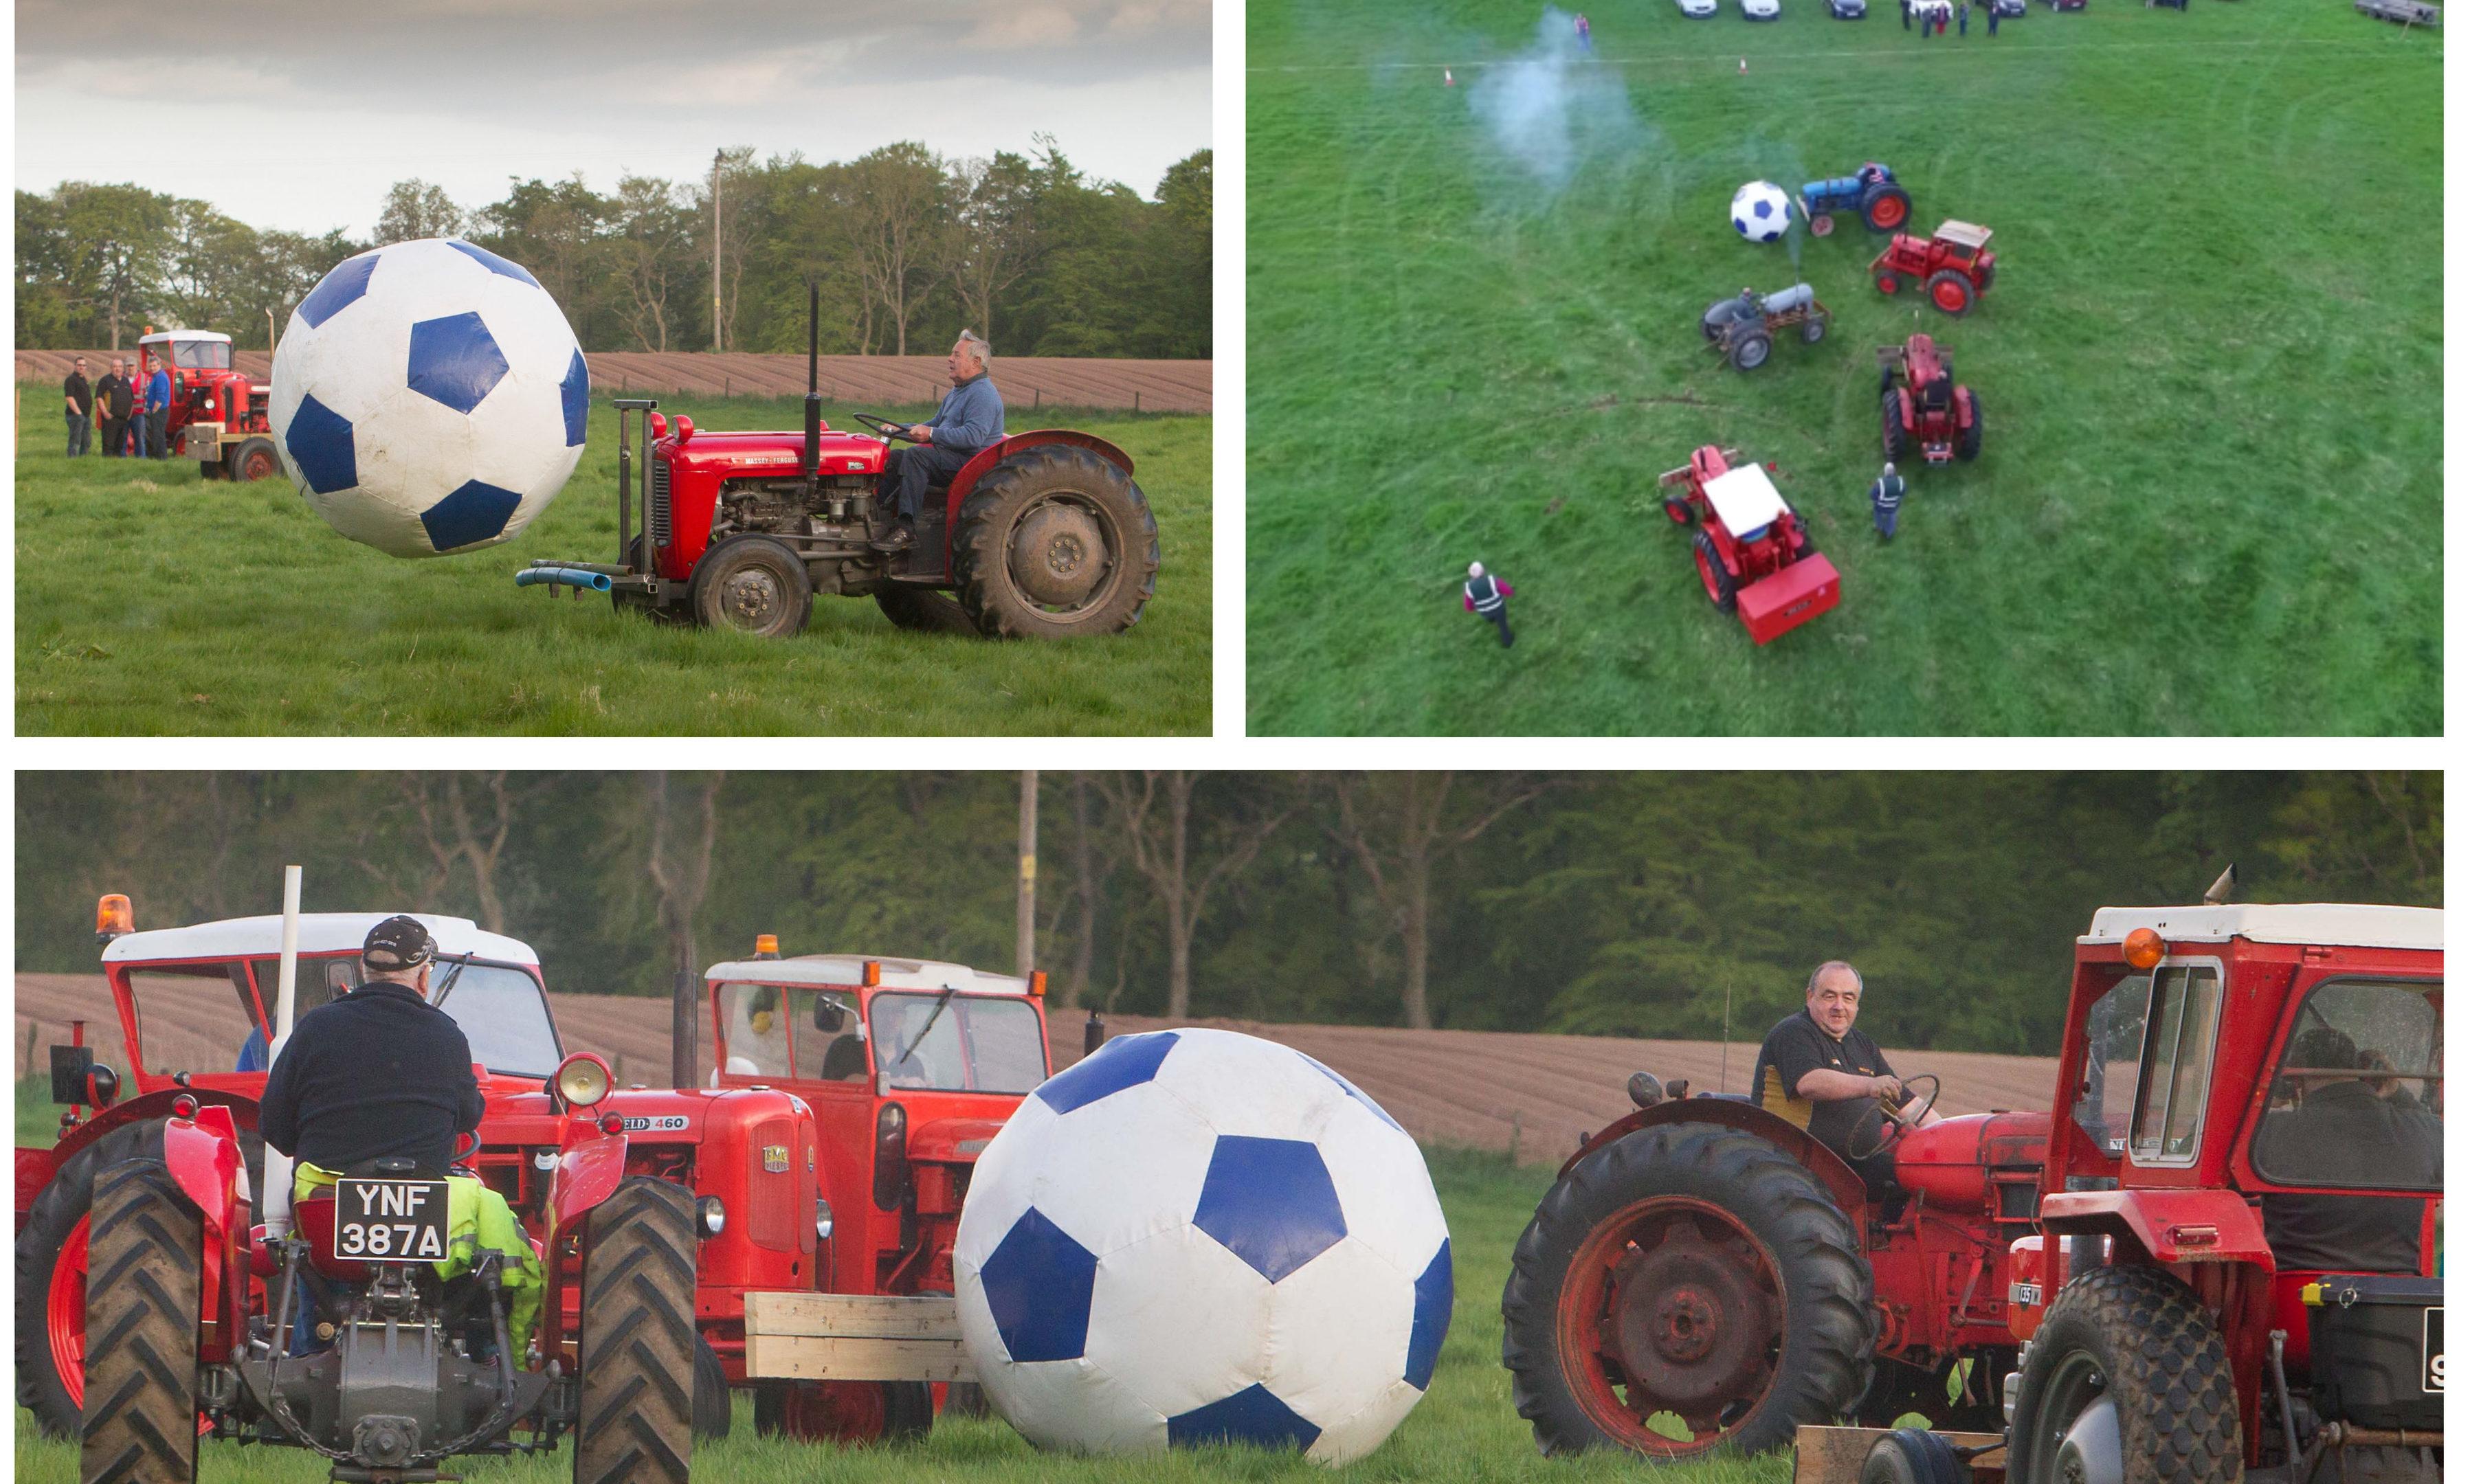 Tractor football in Fettercairn